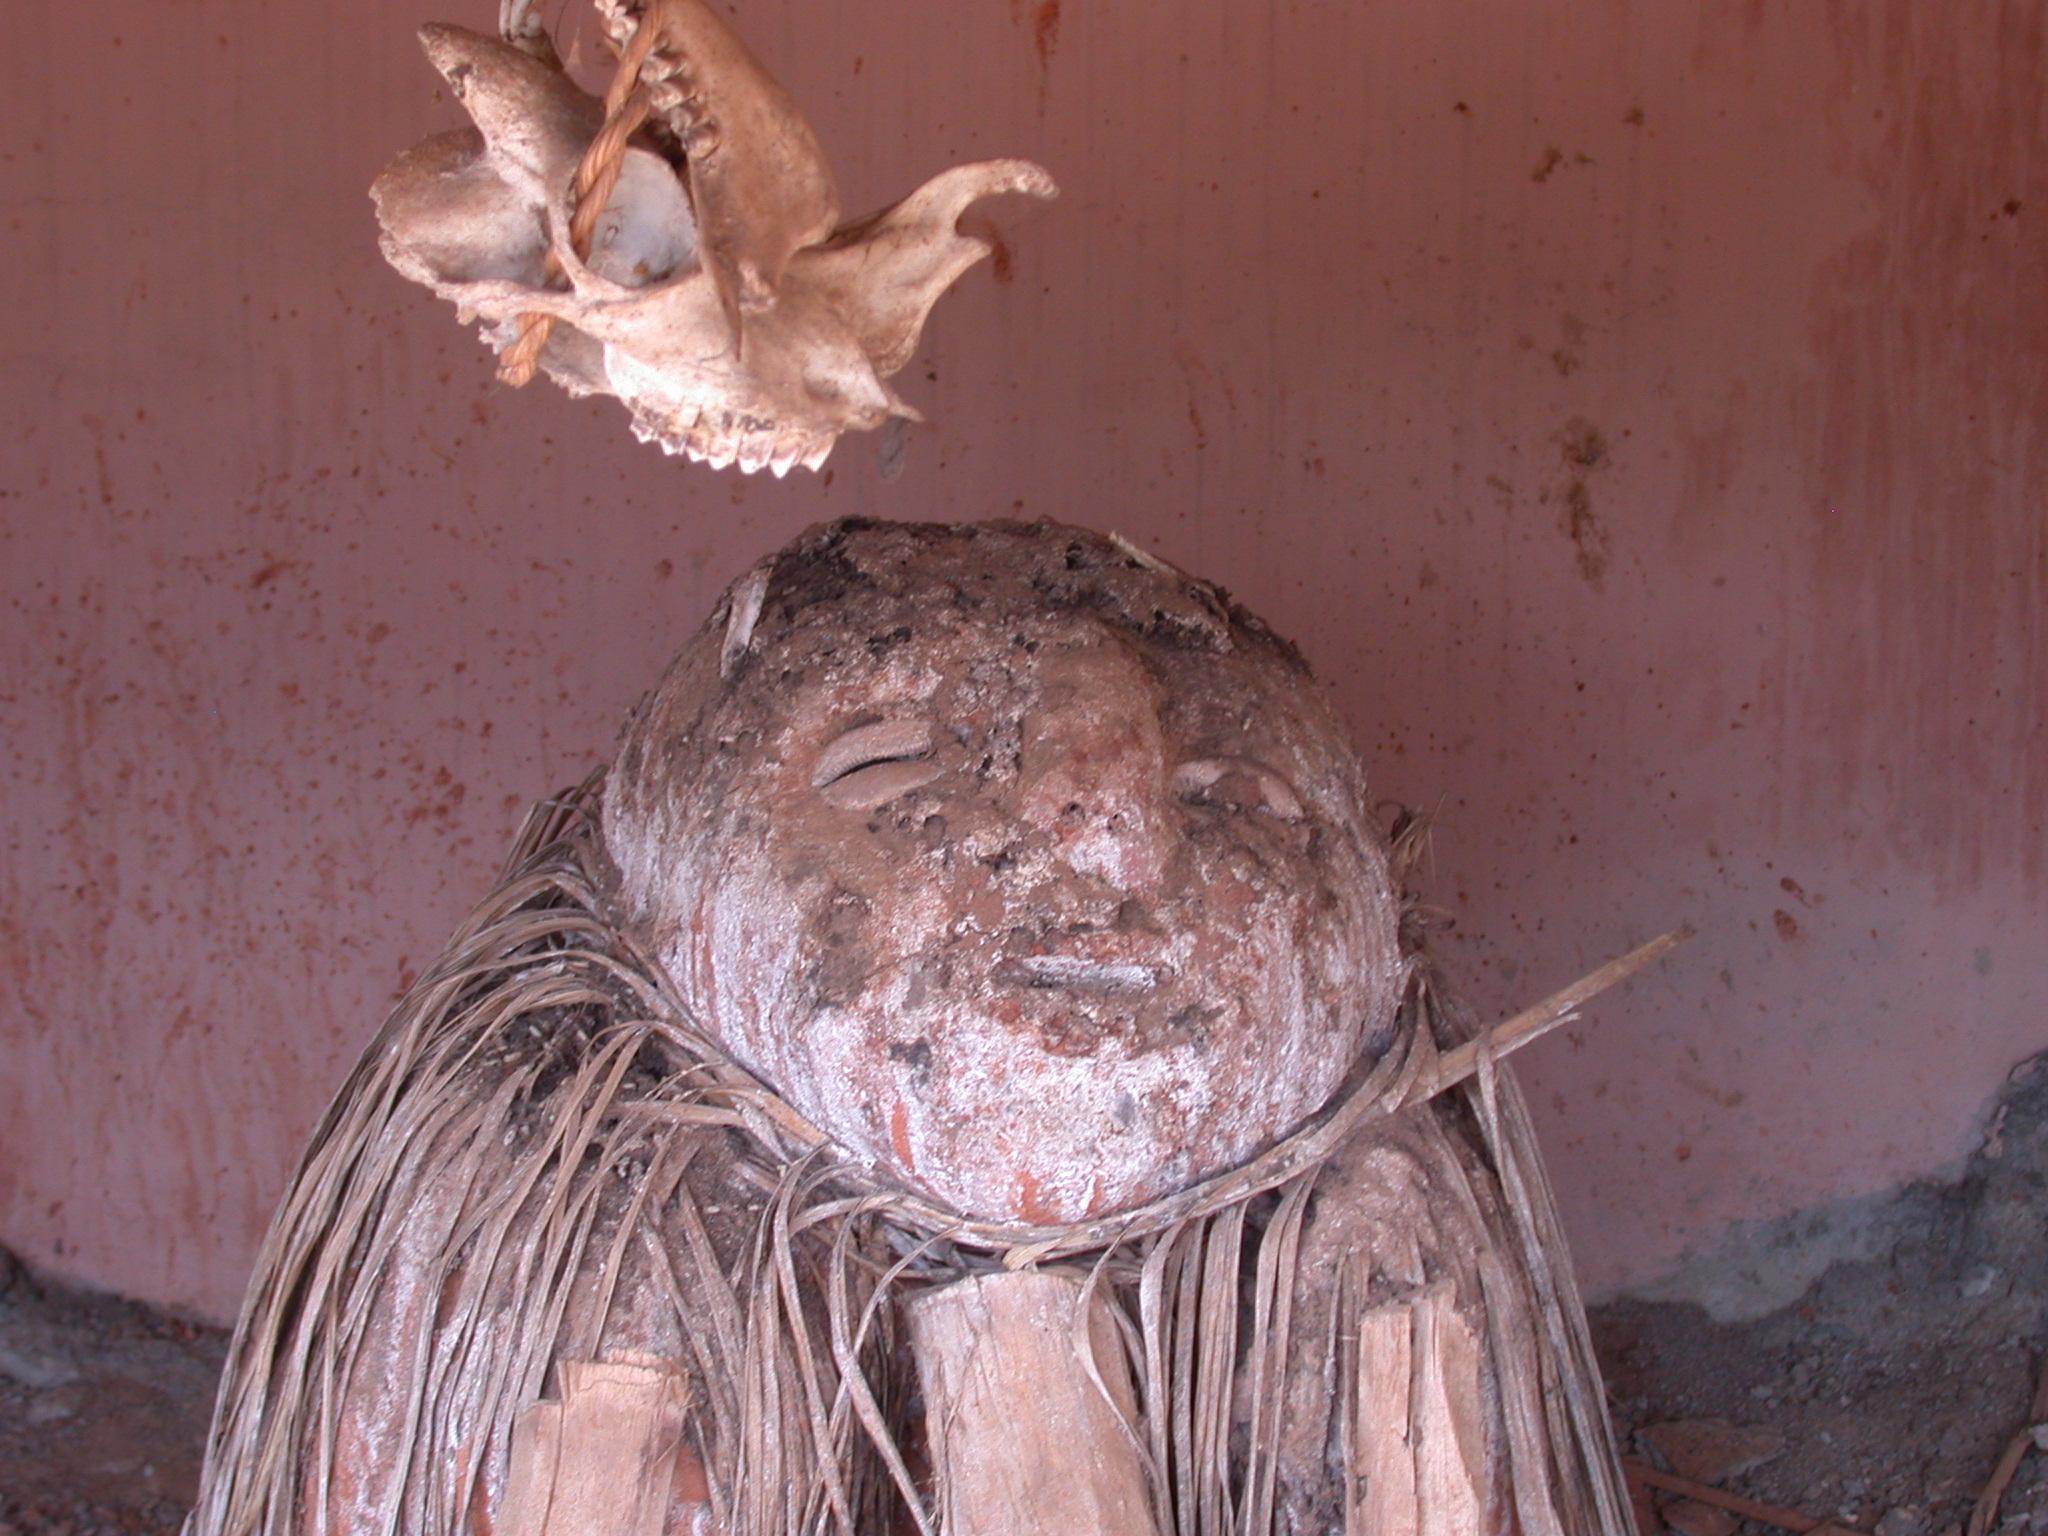 Altar at Zangbeto Kphkli-Yaou Temple, Porto Novo, Benin